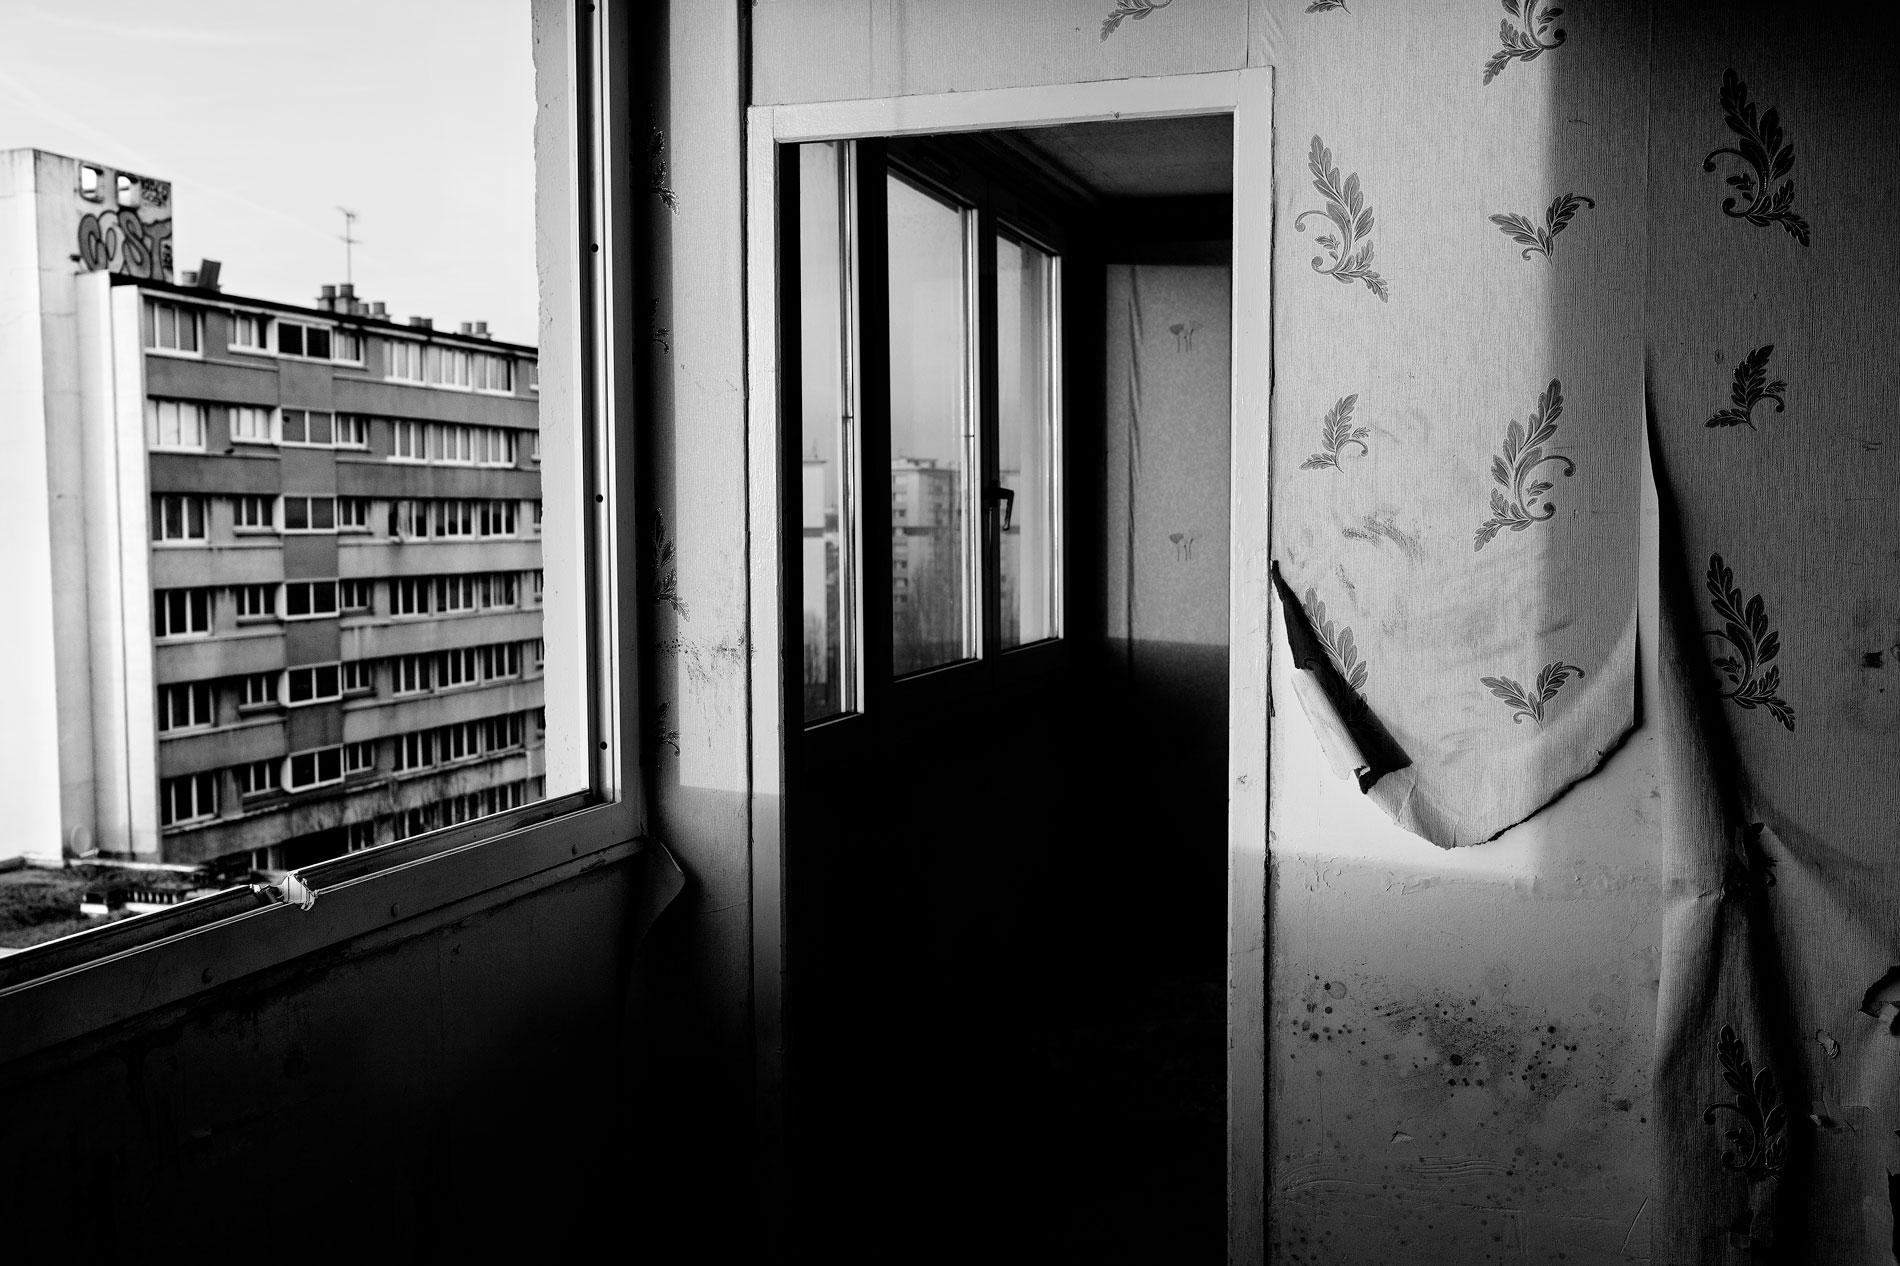 LIFE IN THE PARIS SUBURBS TNY009